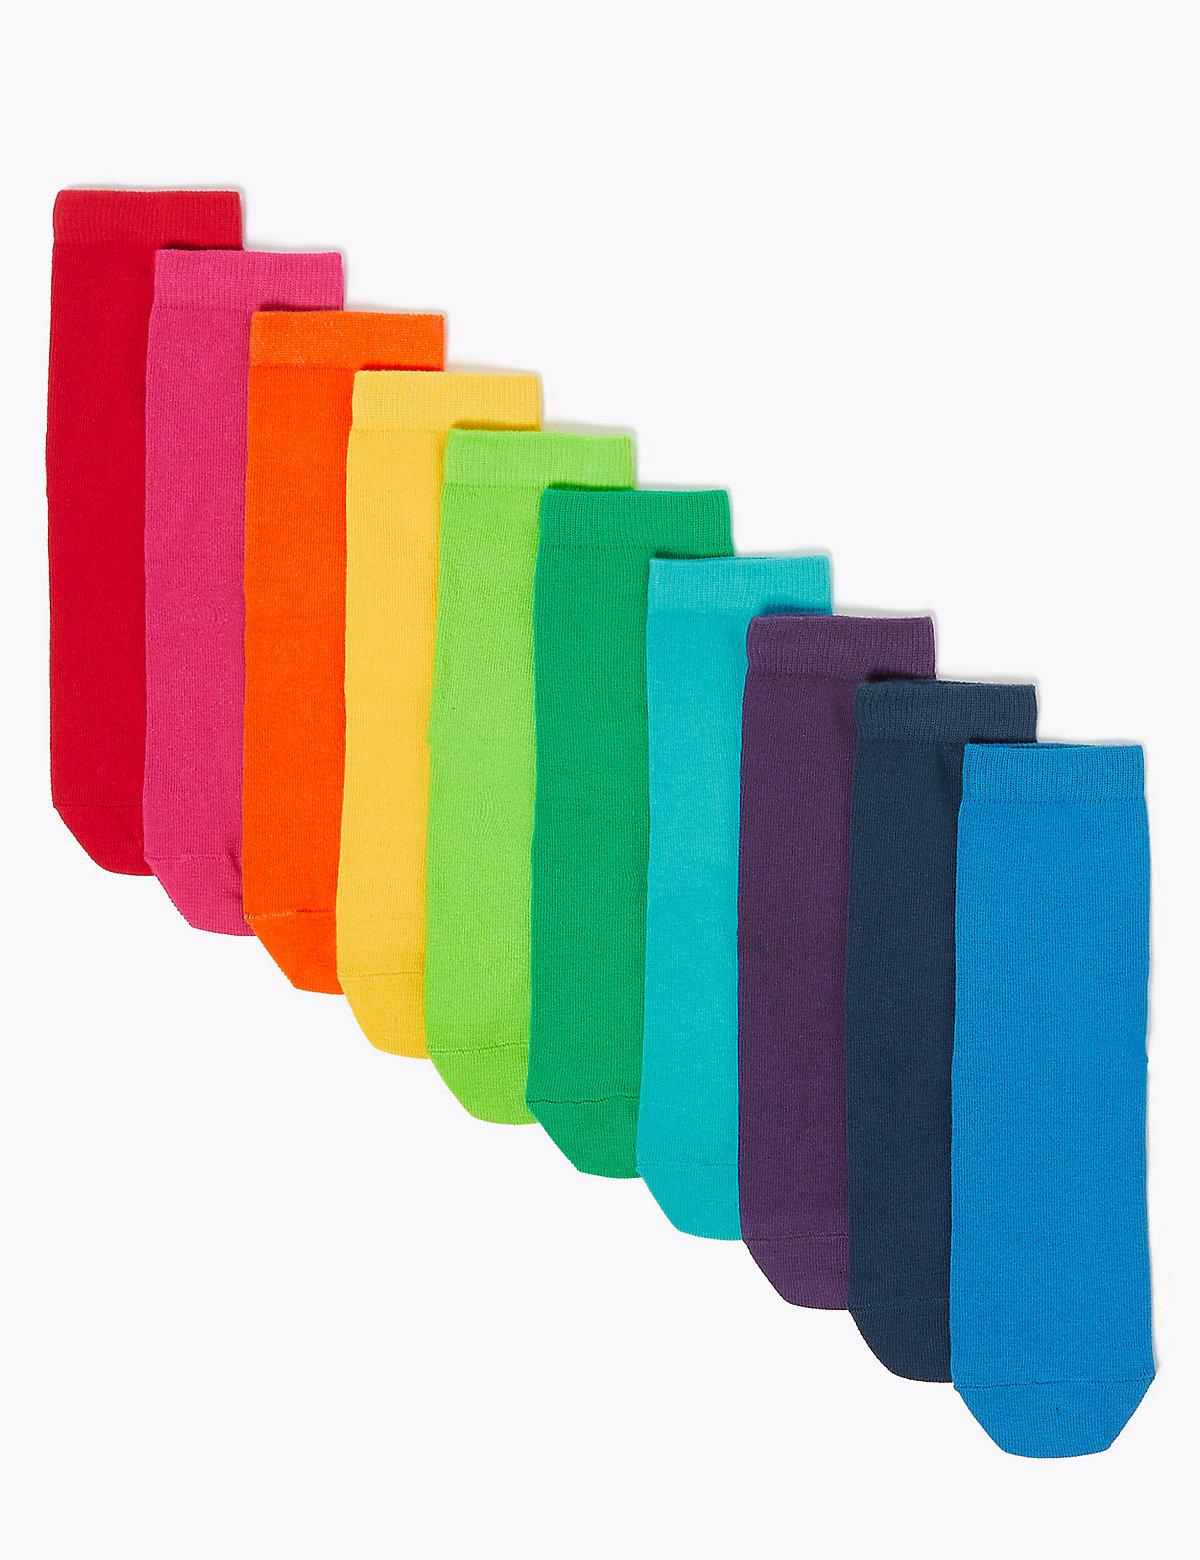 10 Pack Cotton Rich Rainbow Socks